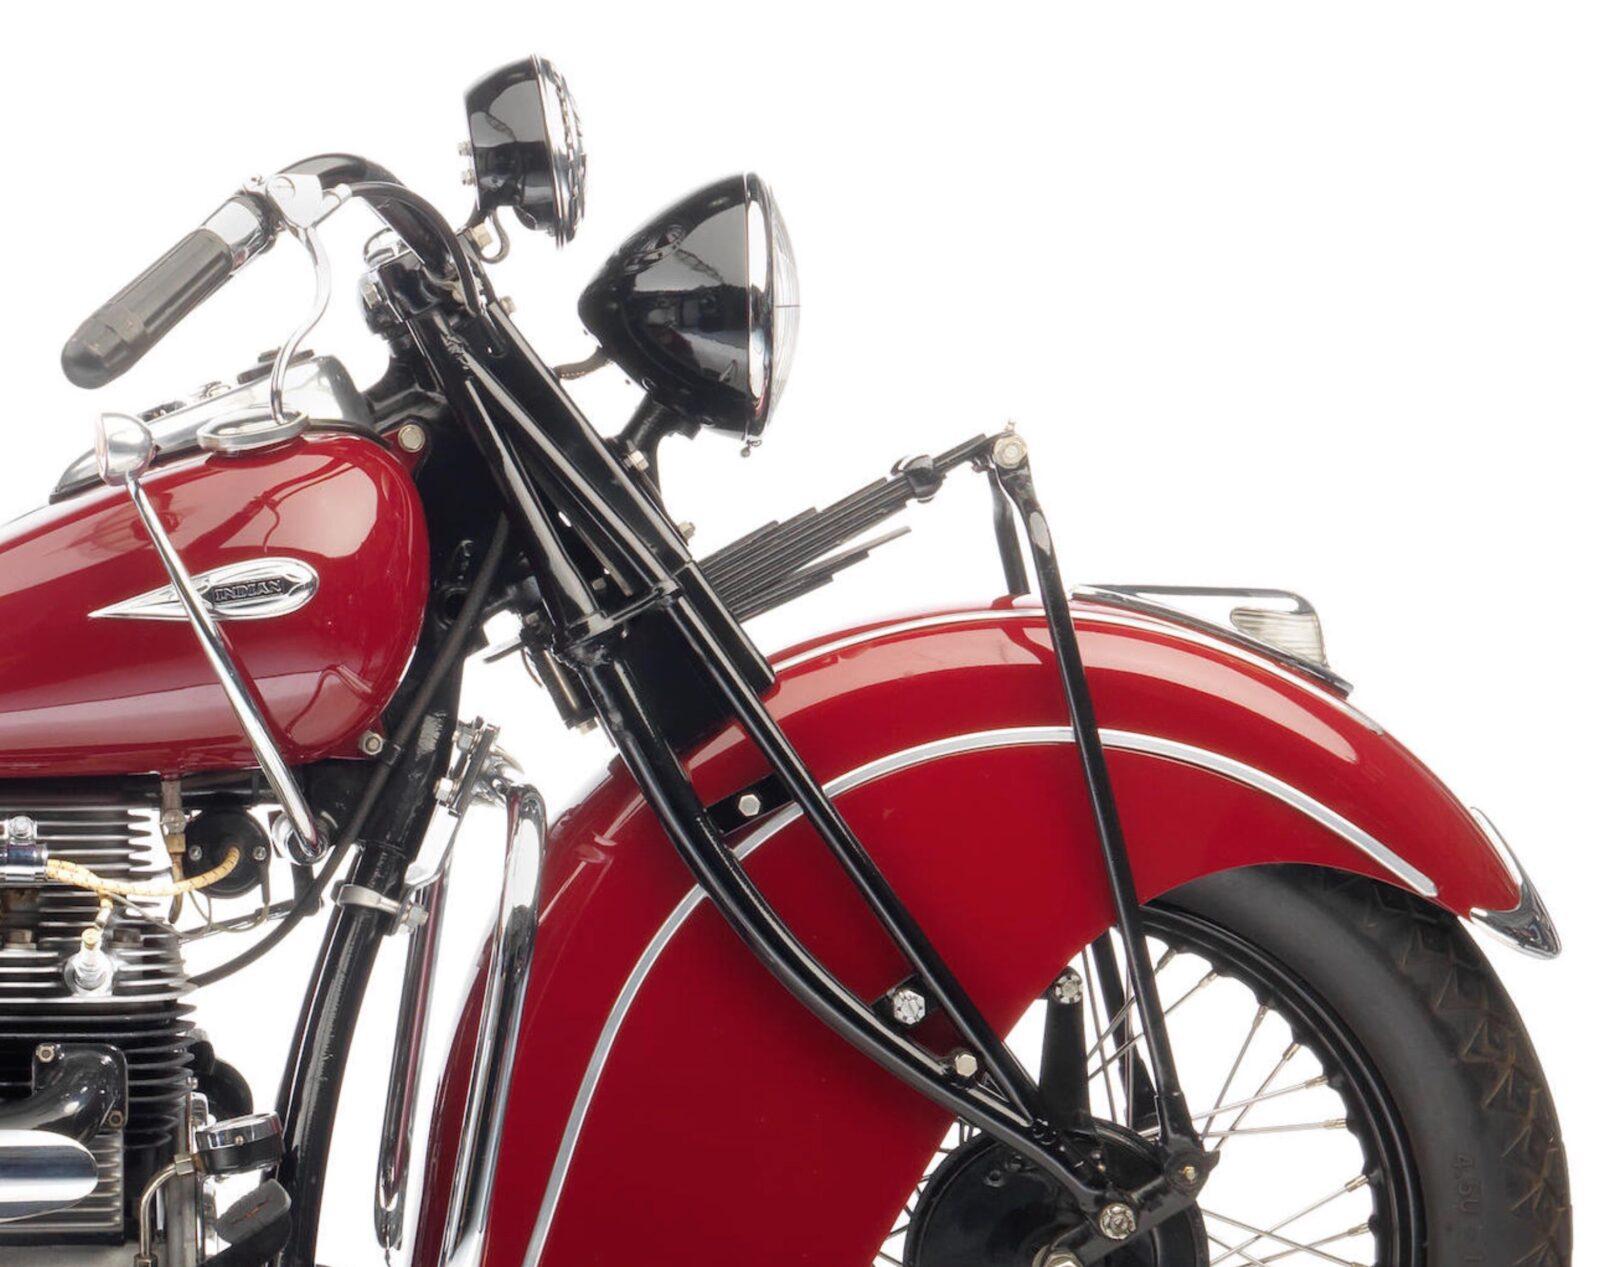 [Imagem: Indian-Four-Motorcycle-Front-Suspension-1600x1267.jpg]